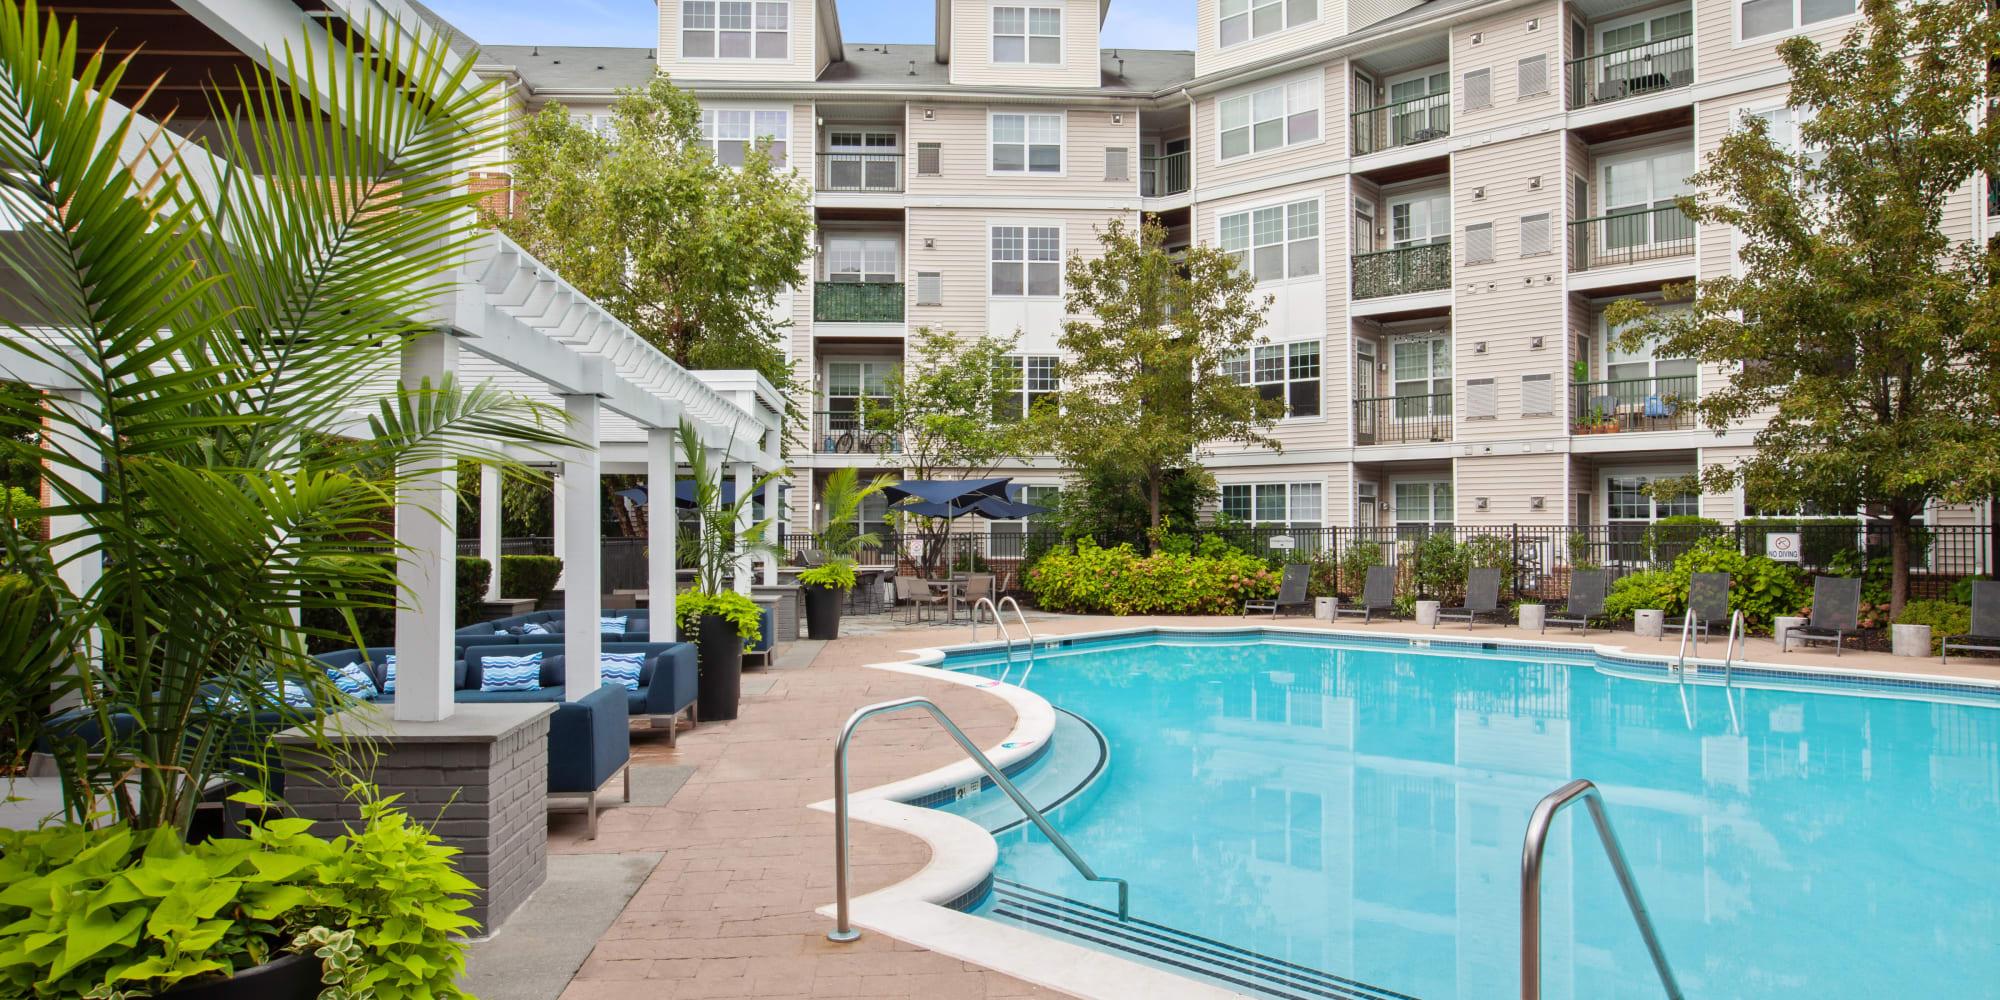 Apartments at Sofi Lyndhurst in Lyndhurst, New Jersey